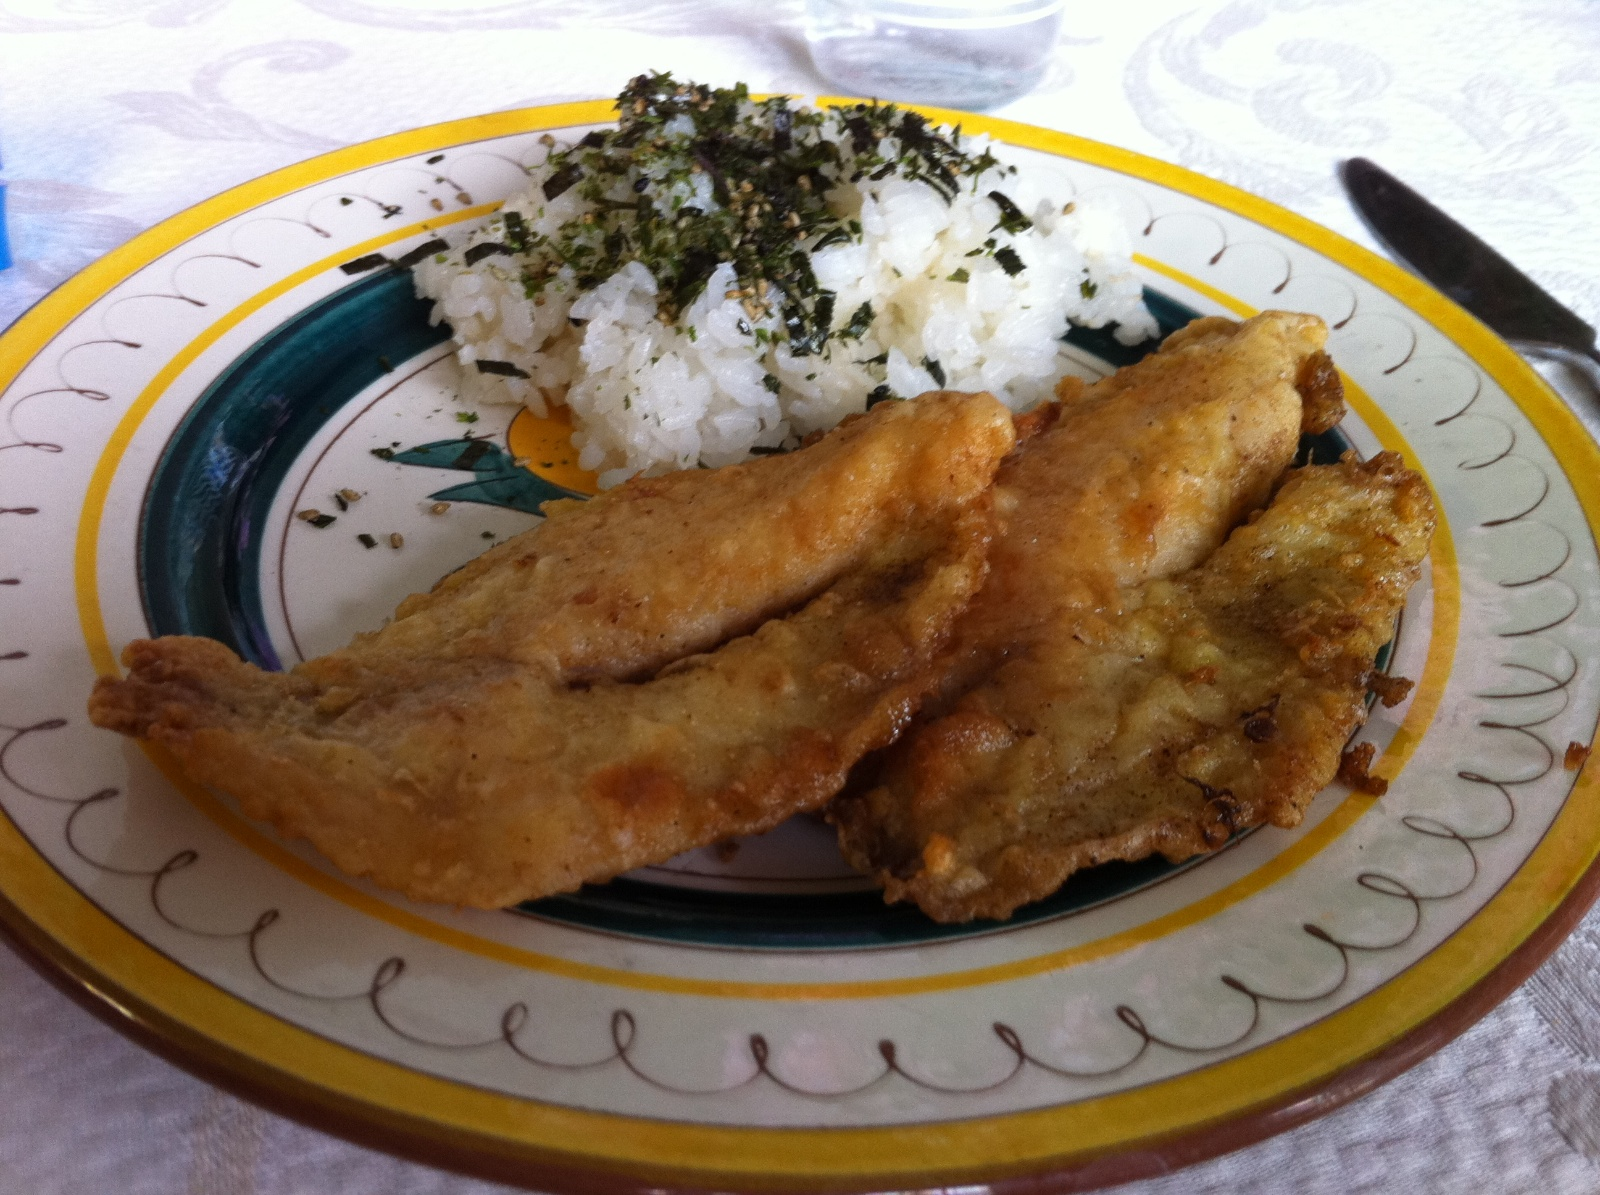 http://blog.rickk.com/food/2011/04/18/ate.2011.04.18.l.jpg